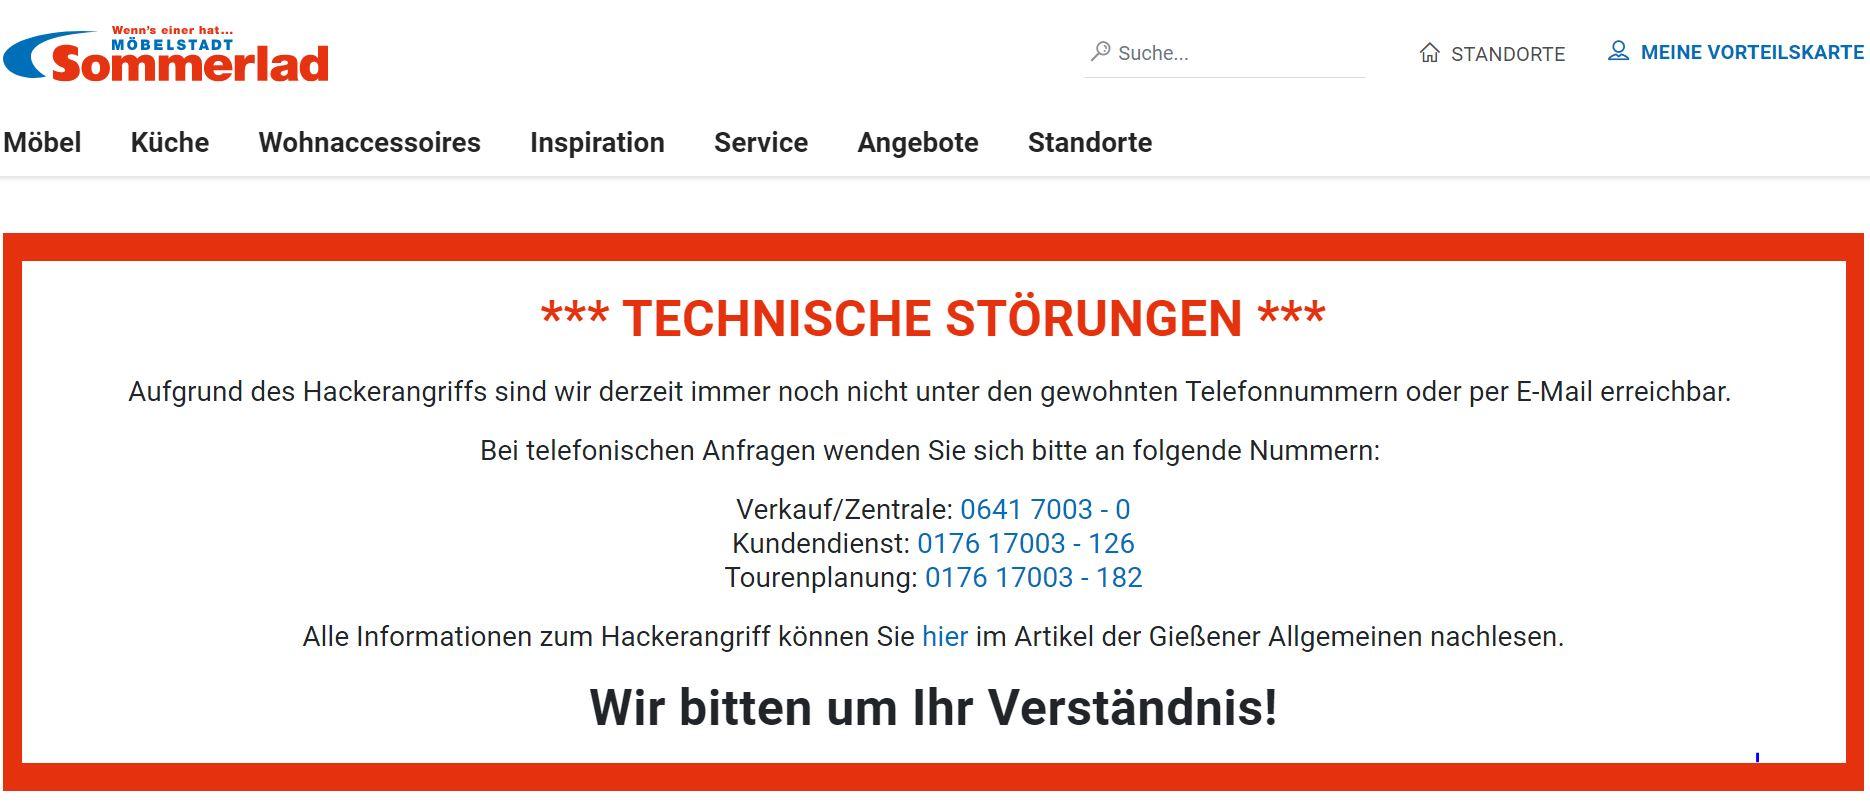 Malfunction Notice -- German